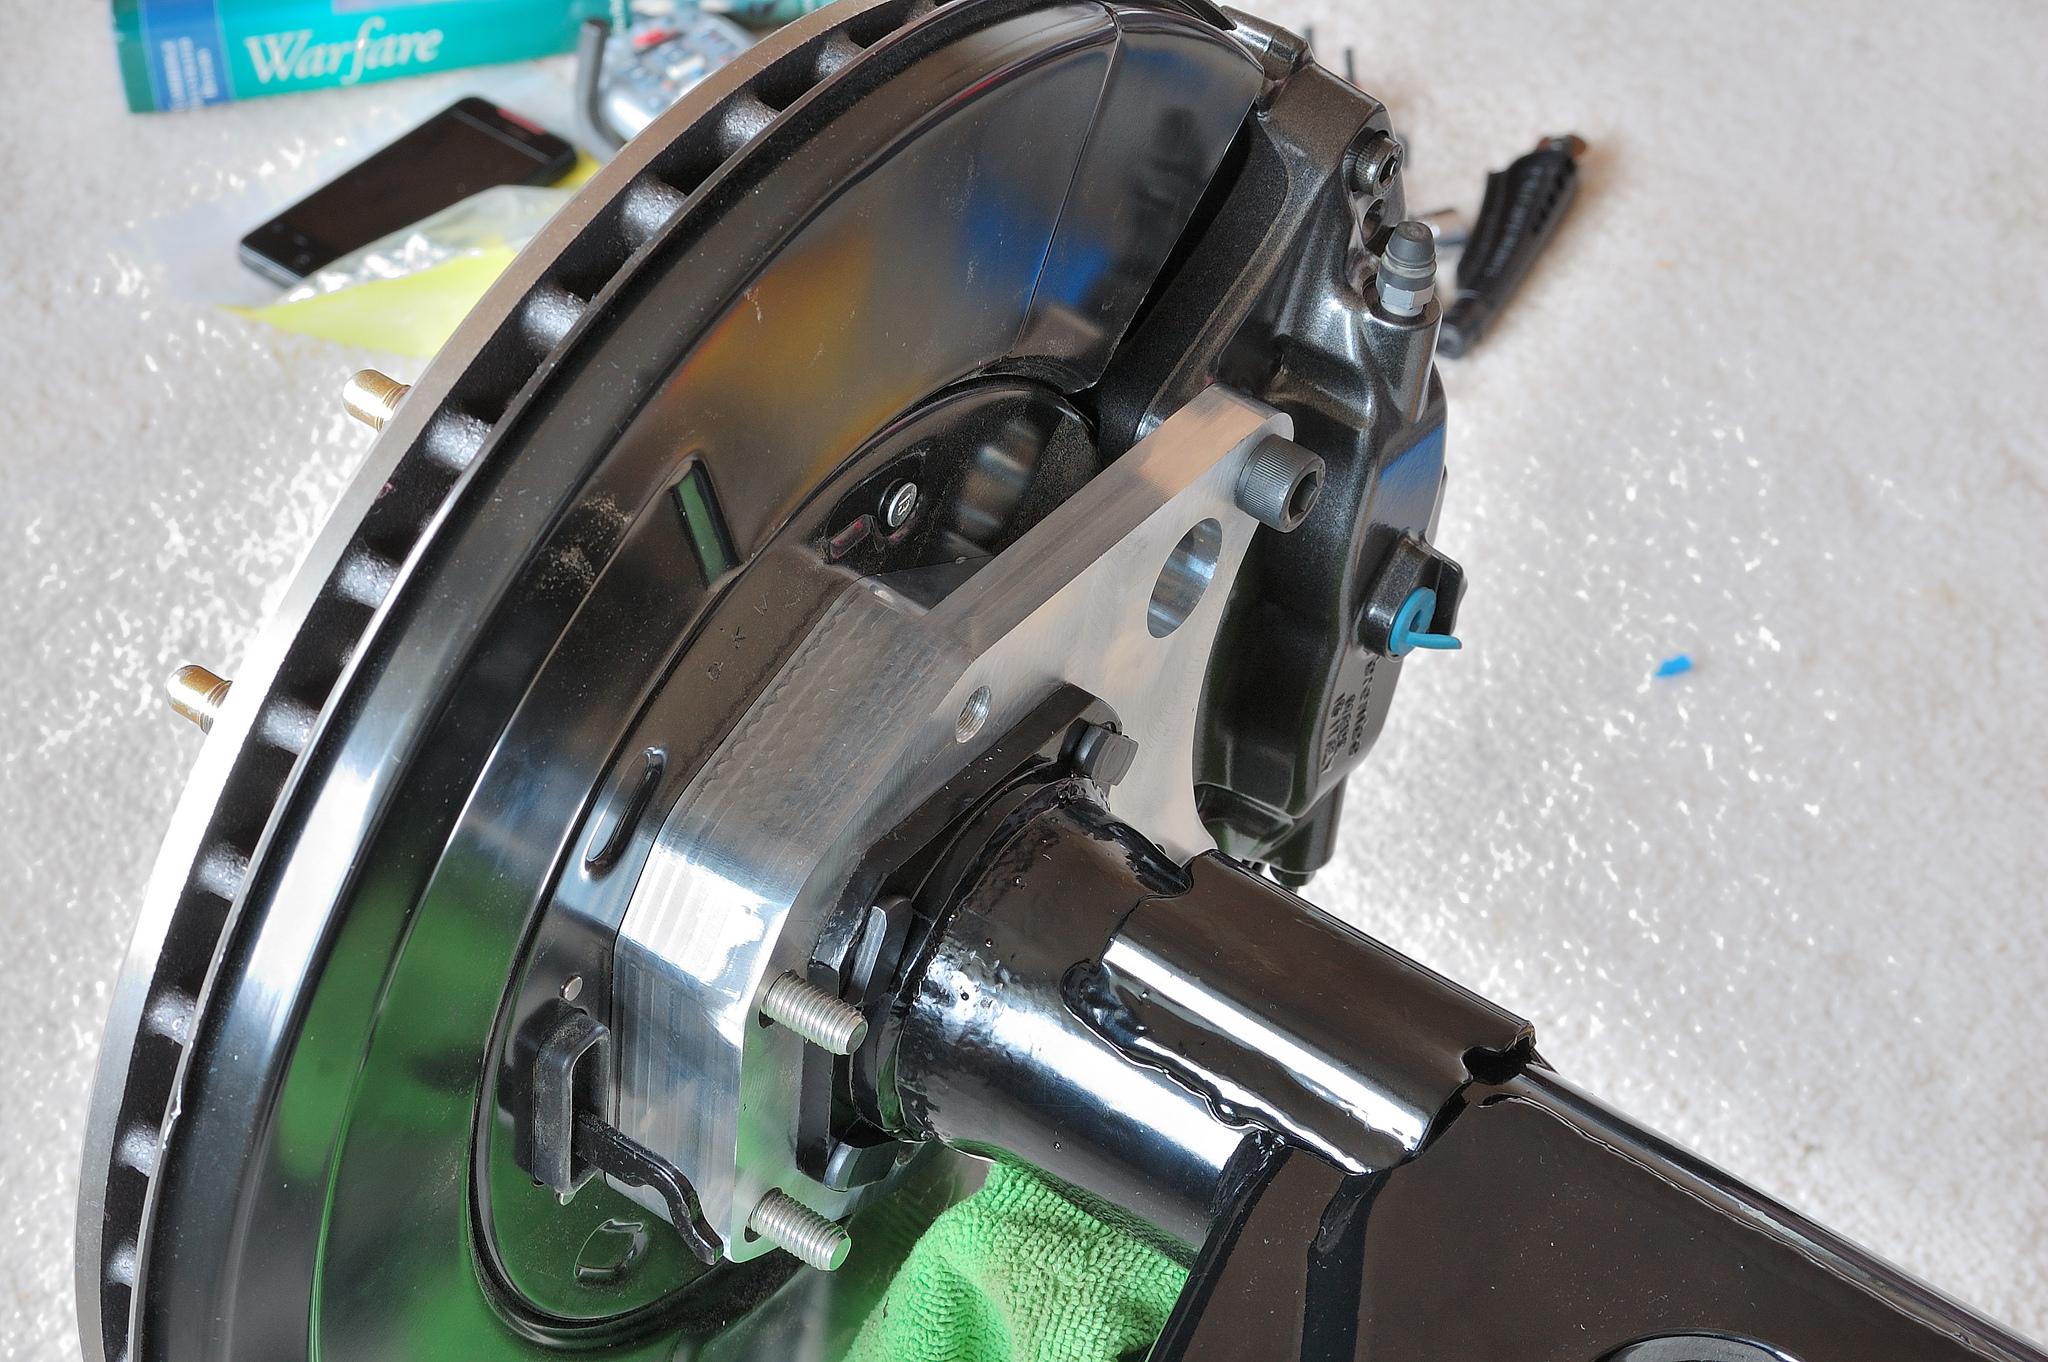 Cts V Brembo 6 Piston Swap On A 1st Gen Archive Wilwood Disc Brake Kitfront Rear6569 Mustangblack Ebay